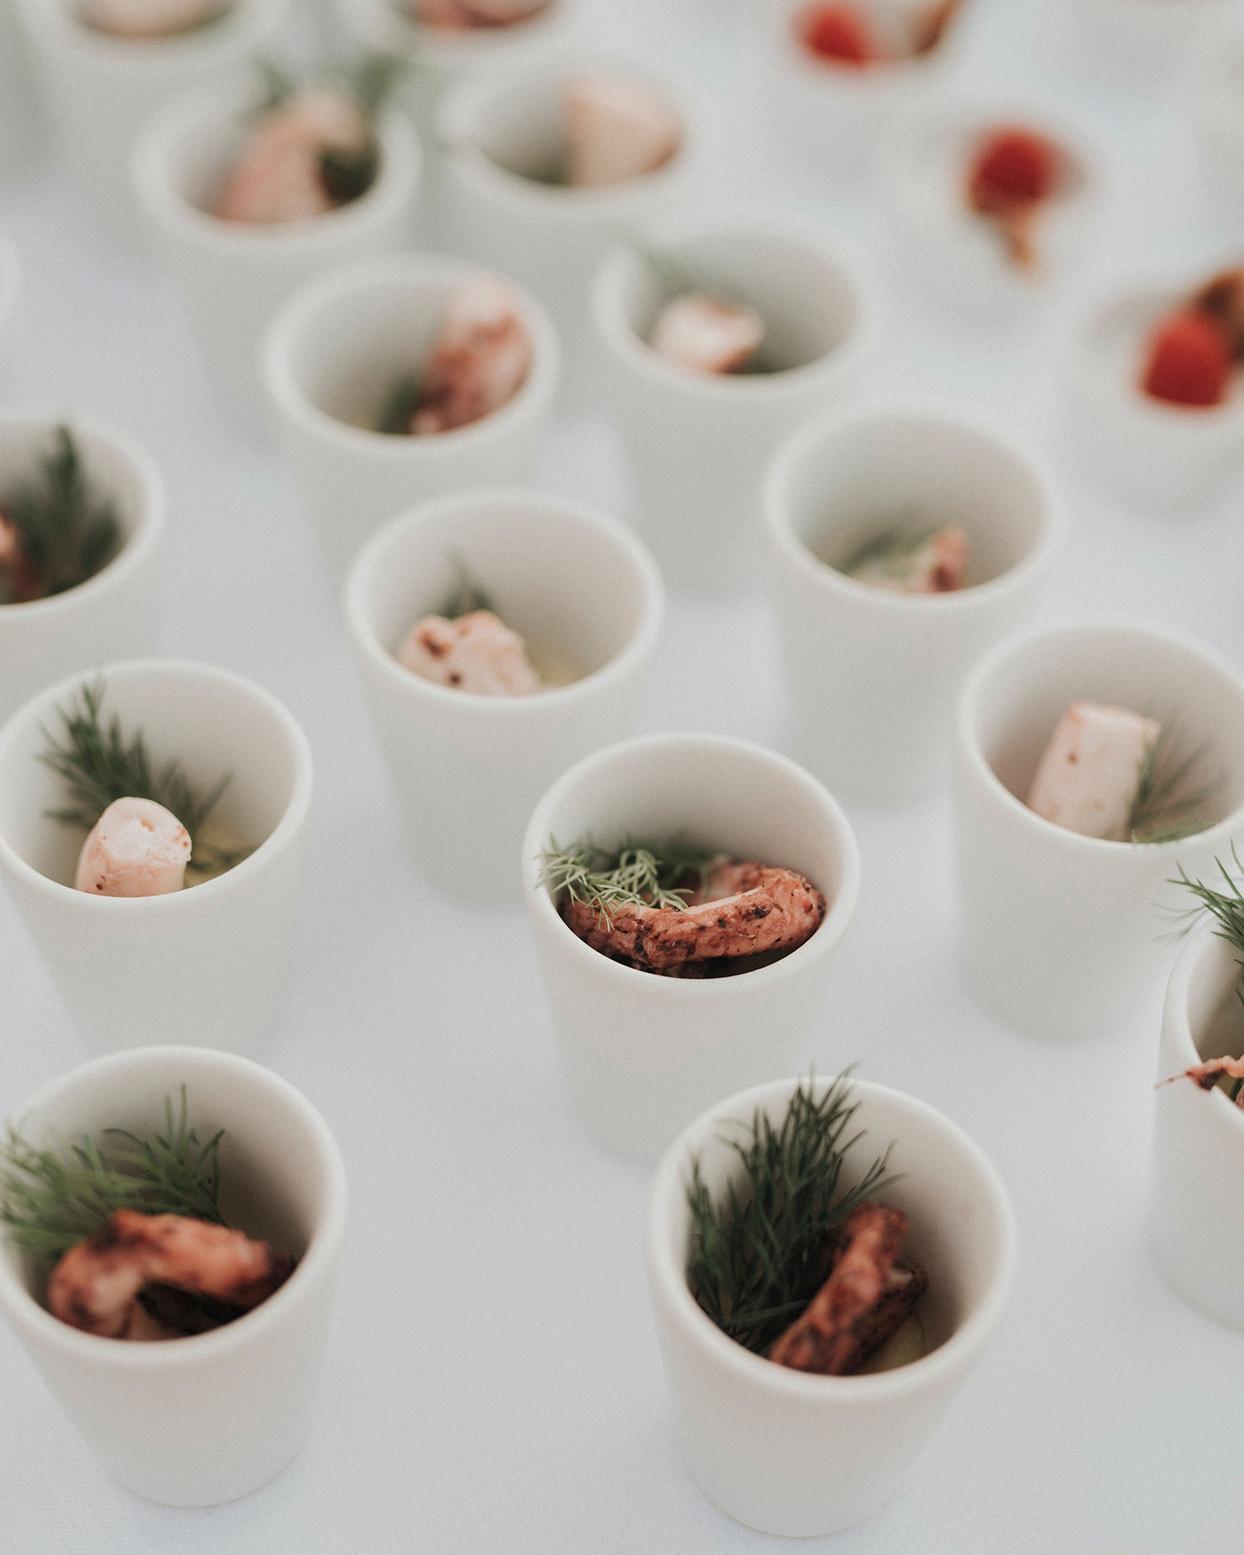 jaclyn antonio wedding shrimp in cups food